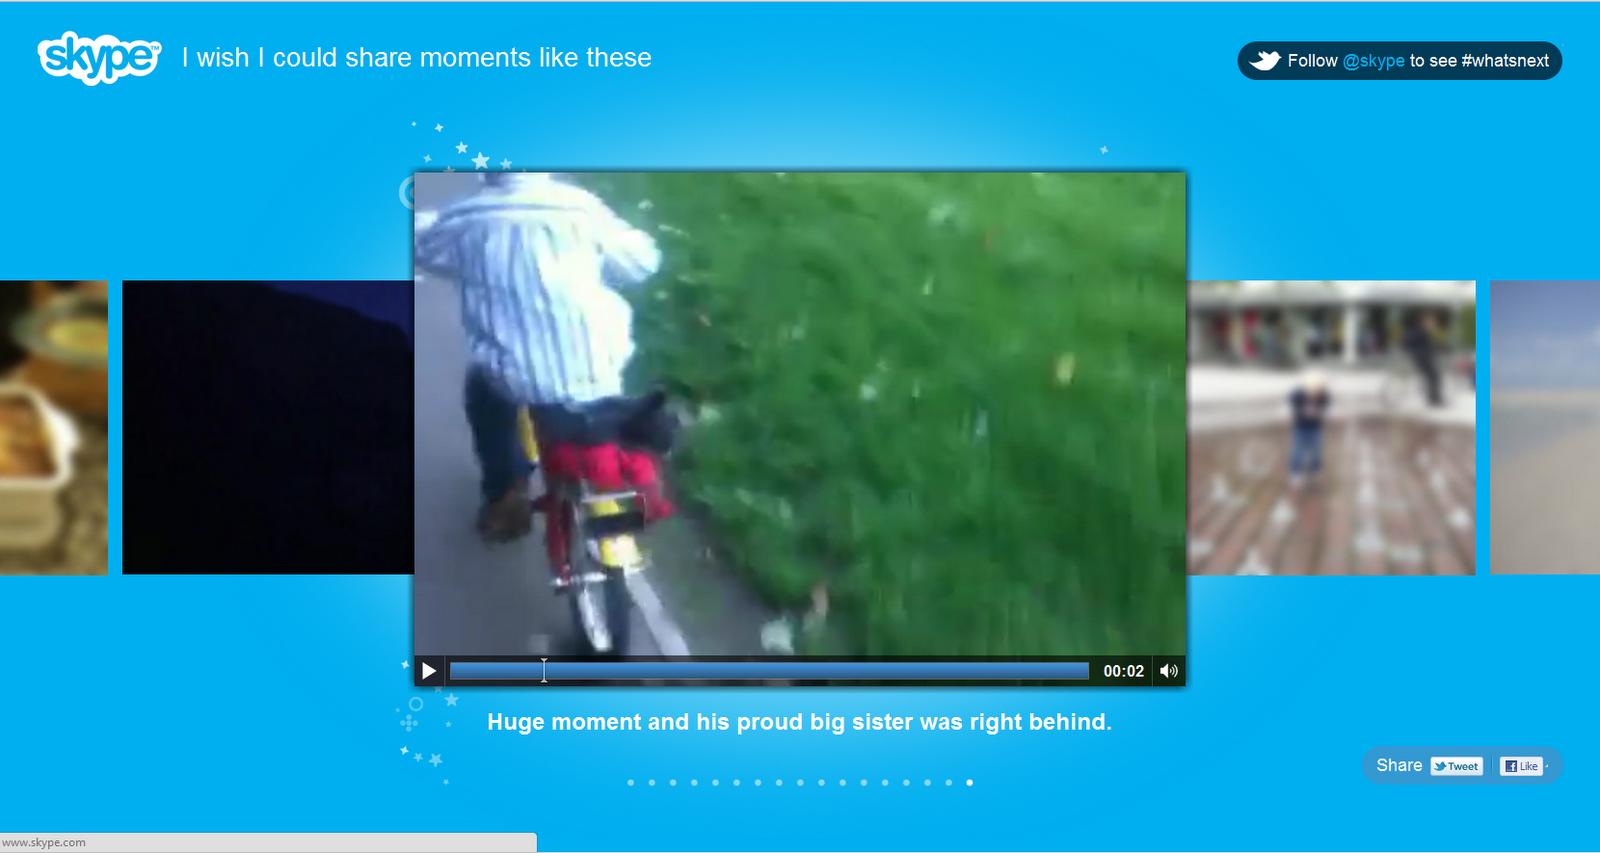 http://3.bp.blogspot.com/_dZfHL6TjLEo/TRtN_sgOEFI/AAAAAAAAA_E/w-HAwagdUCI/s1600/skype+video+chat+app.png